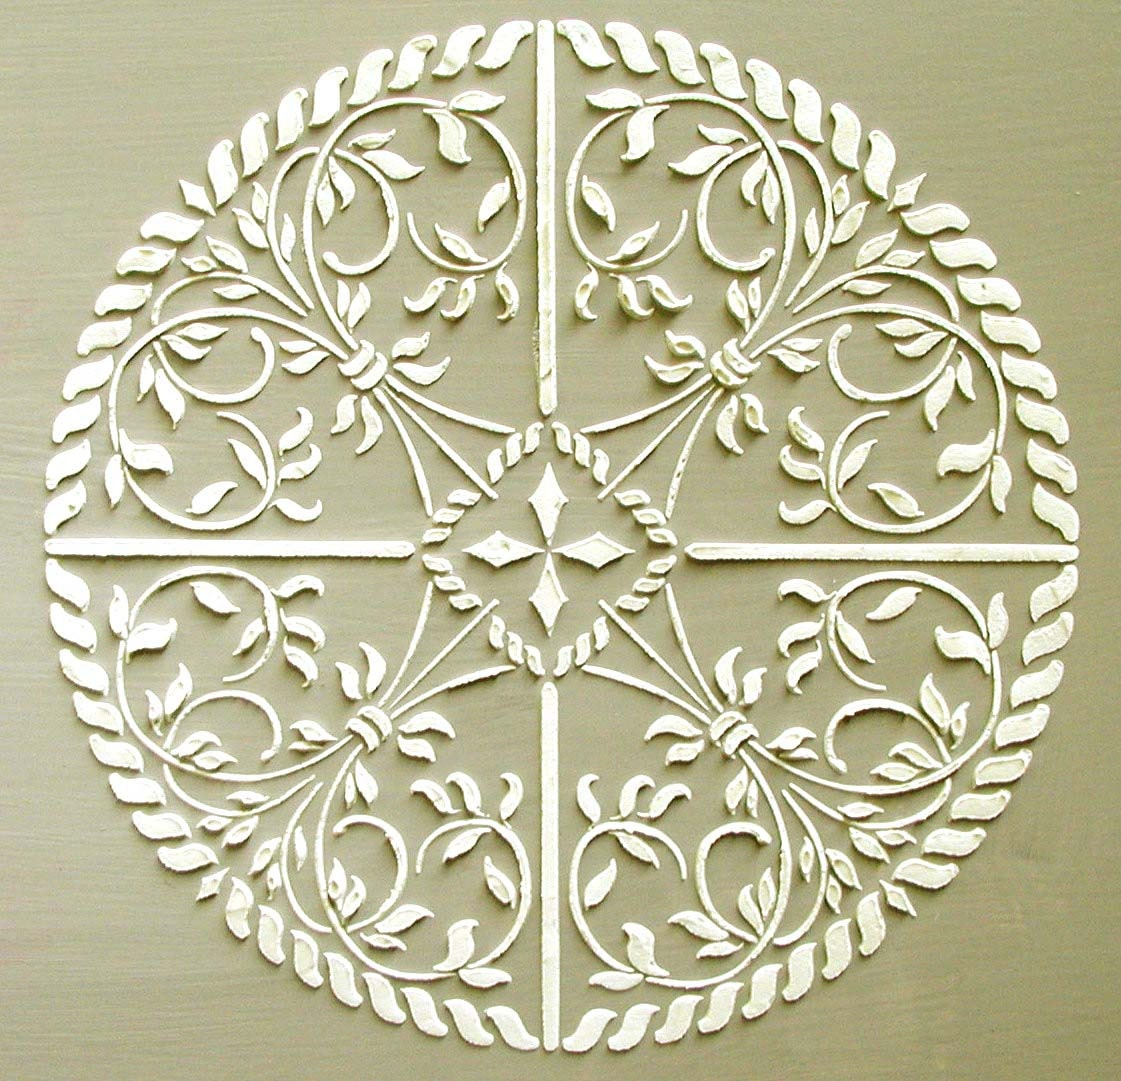 Wall painting stencils designs - Raised Plaster Astana Medallion Stencil Wall Stencil